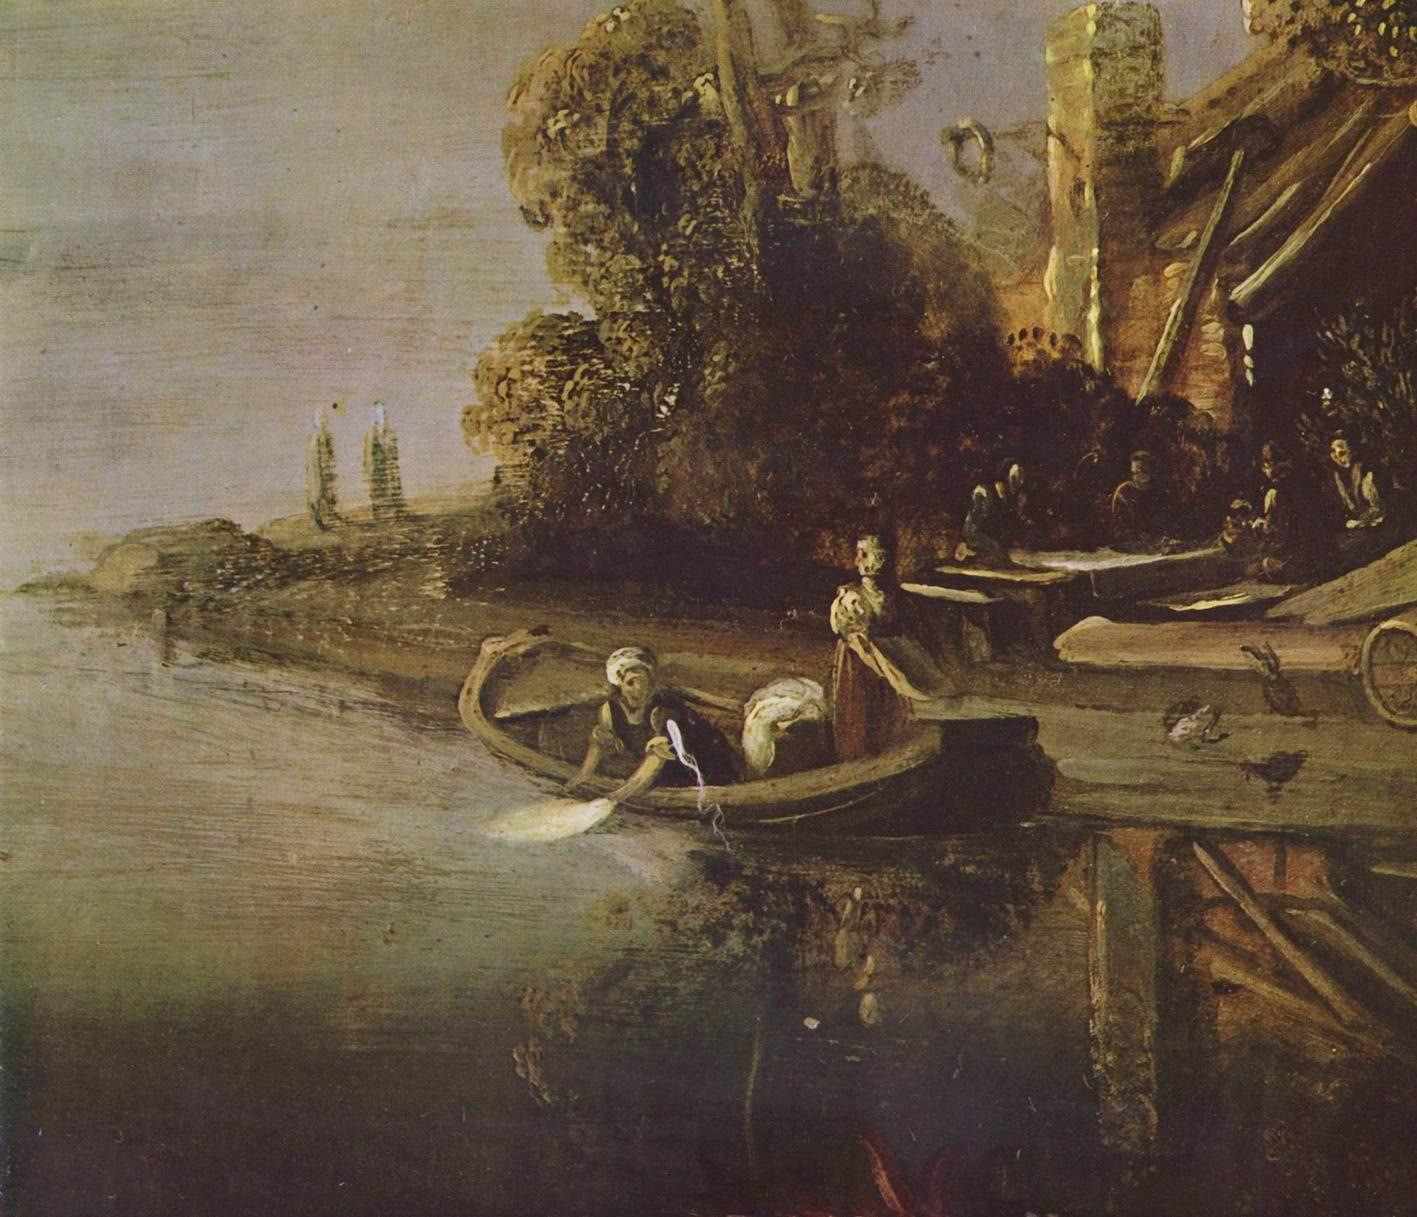 Ангел и Товия с рыбой. Фрагмент, Ластман Питер Питерс